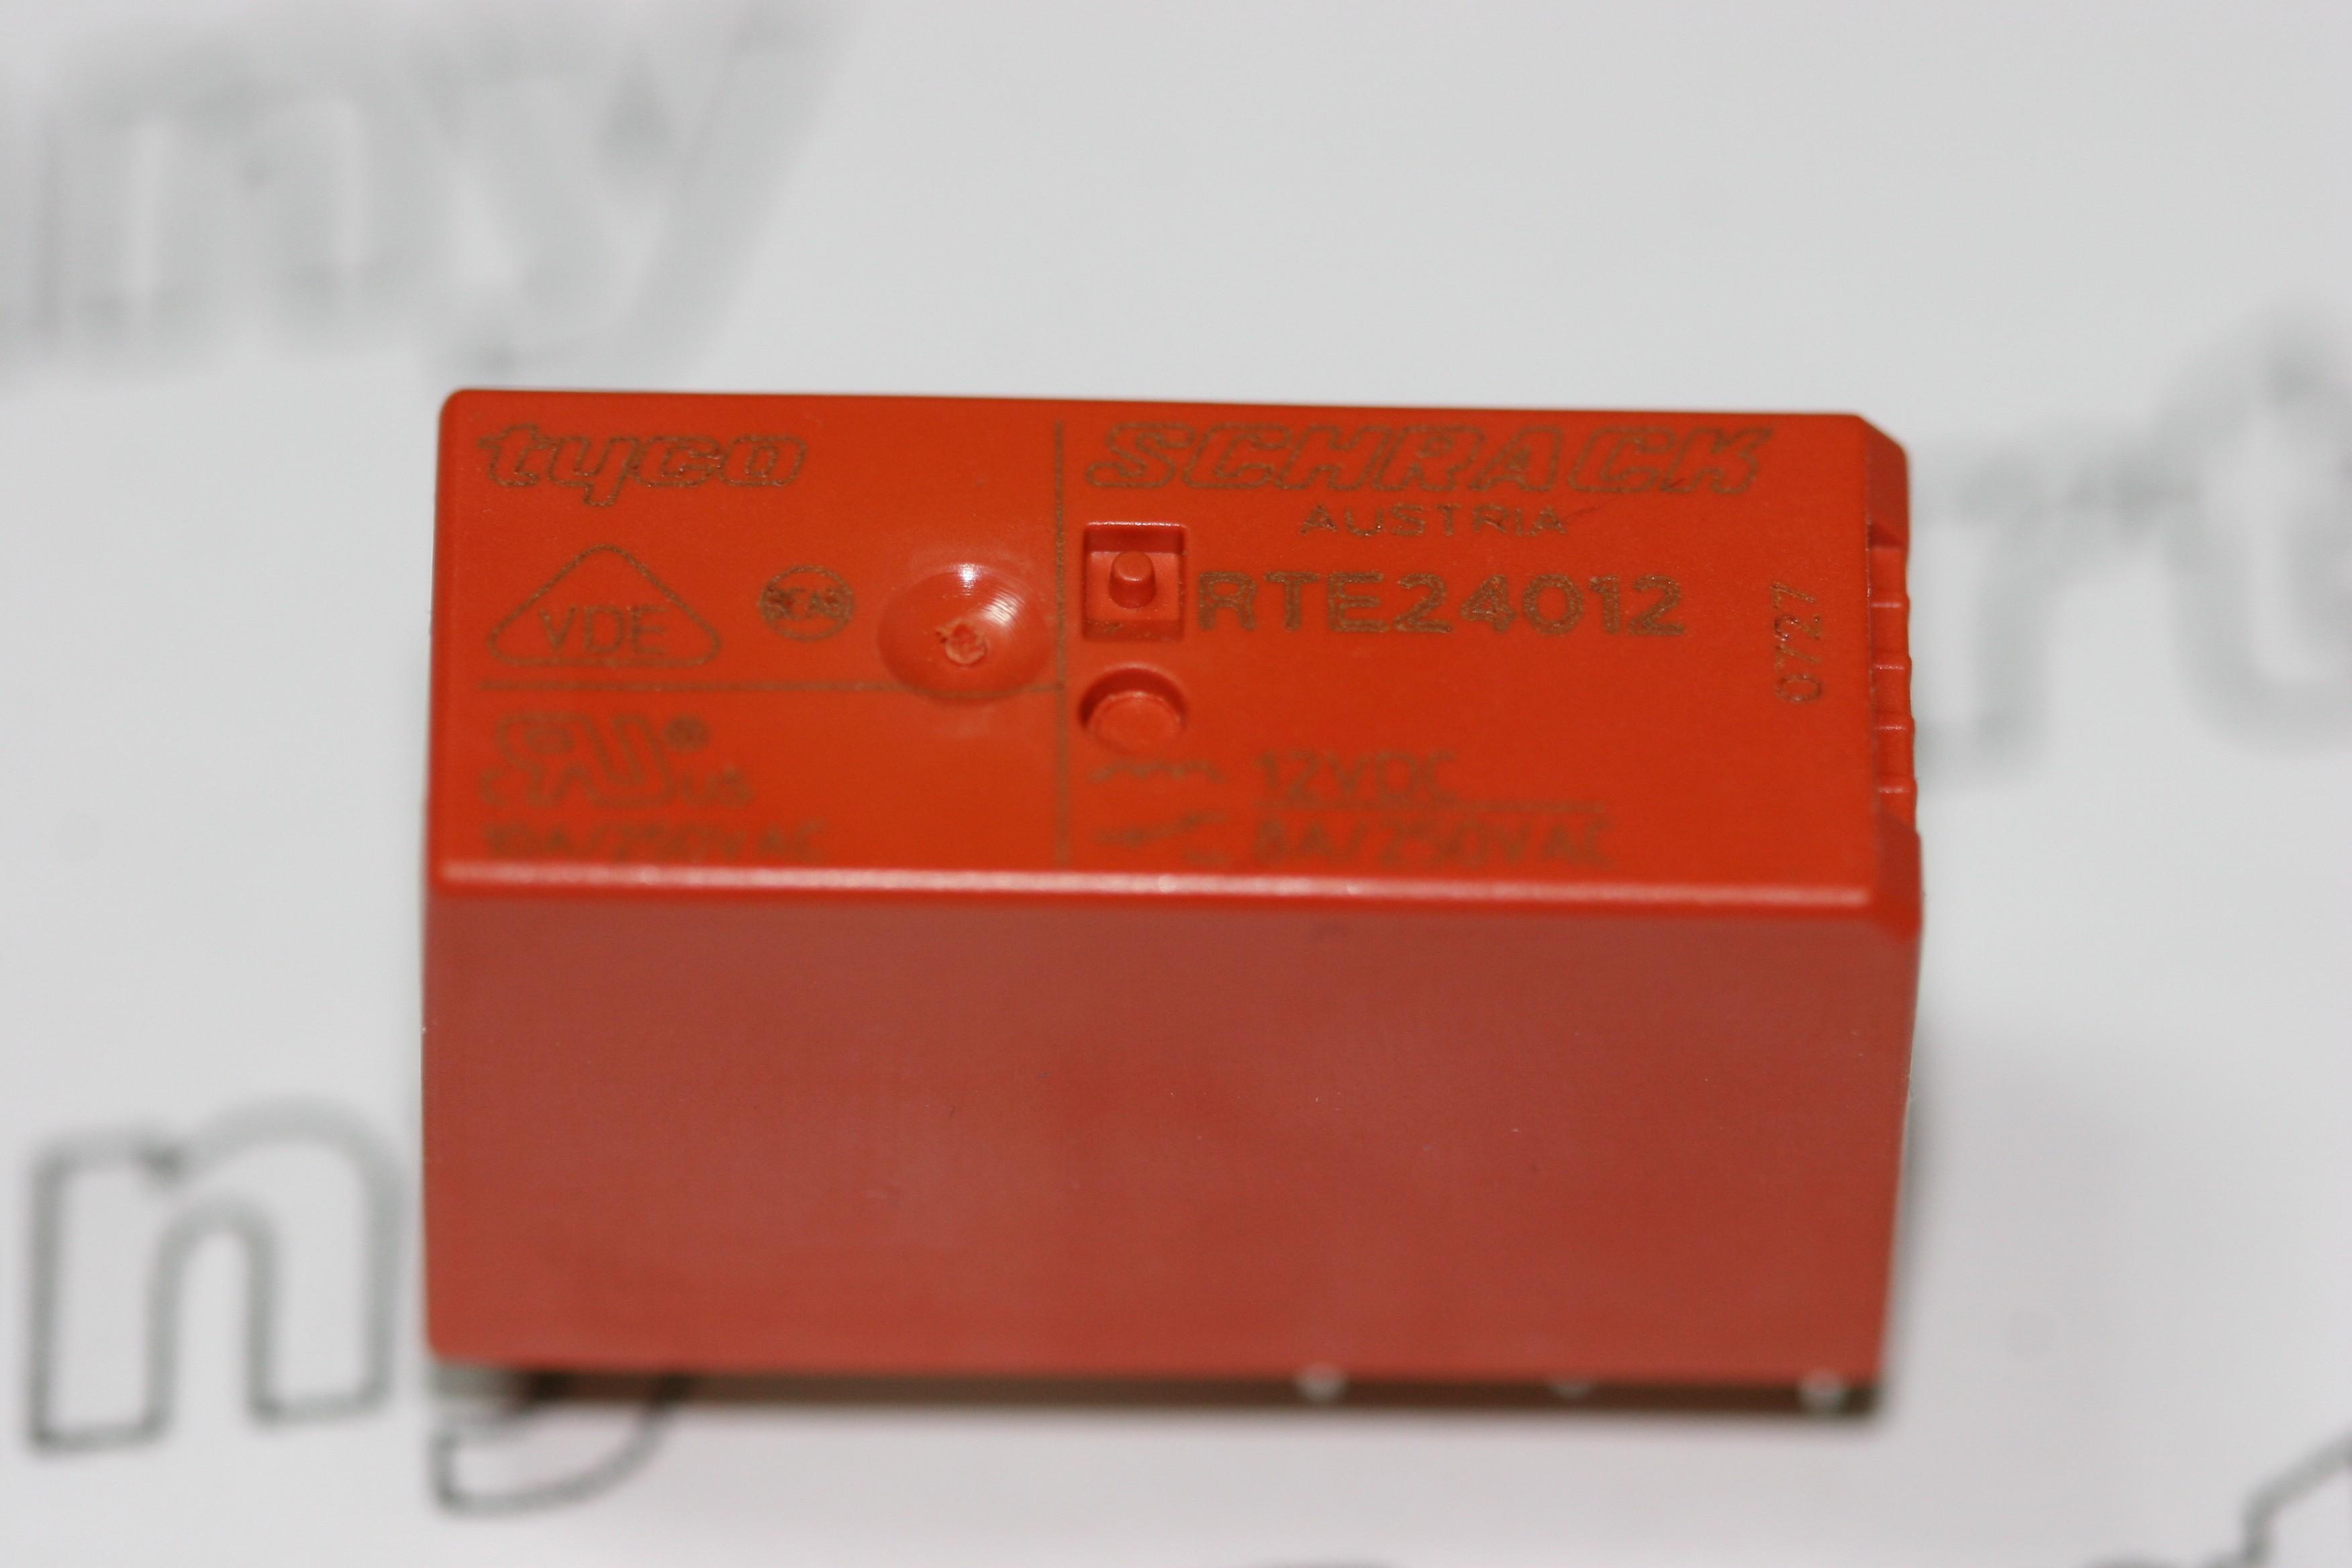 RTE Schrack General Purpose Relay V Coil DPDT A V - Dpdt relay buy